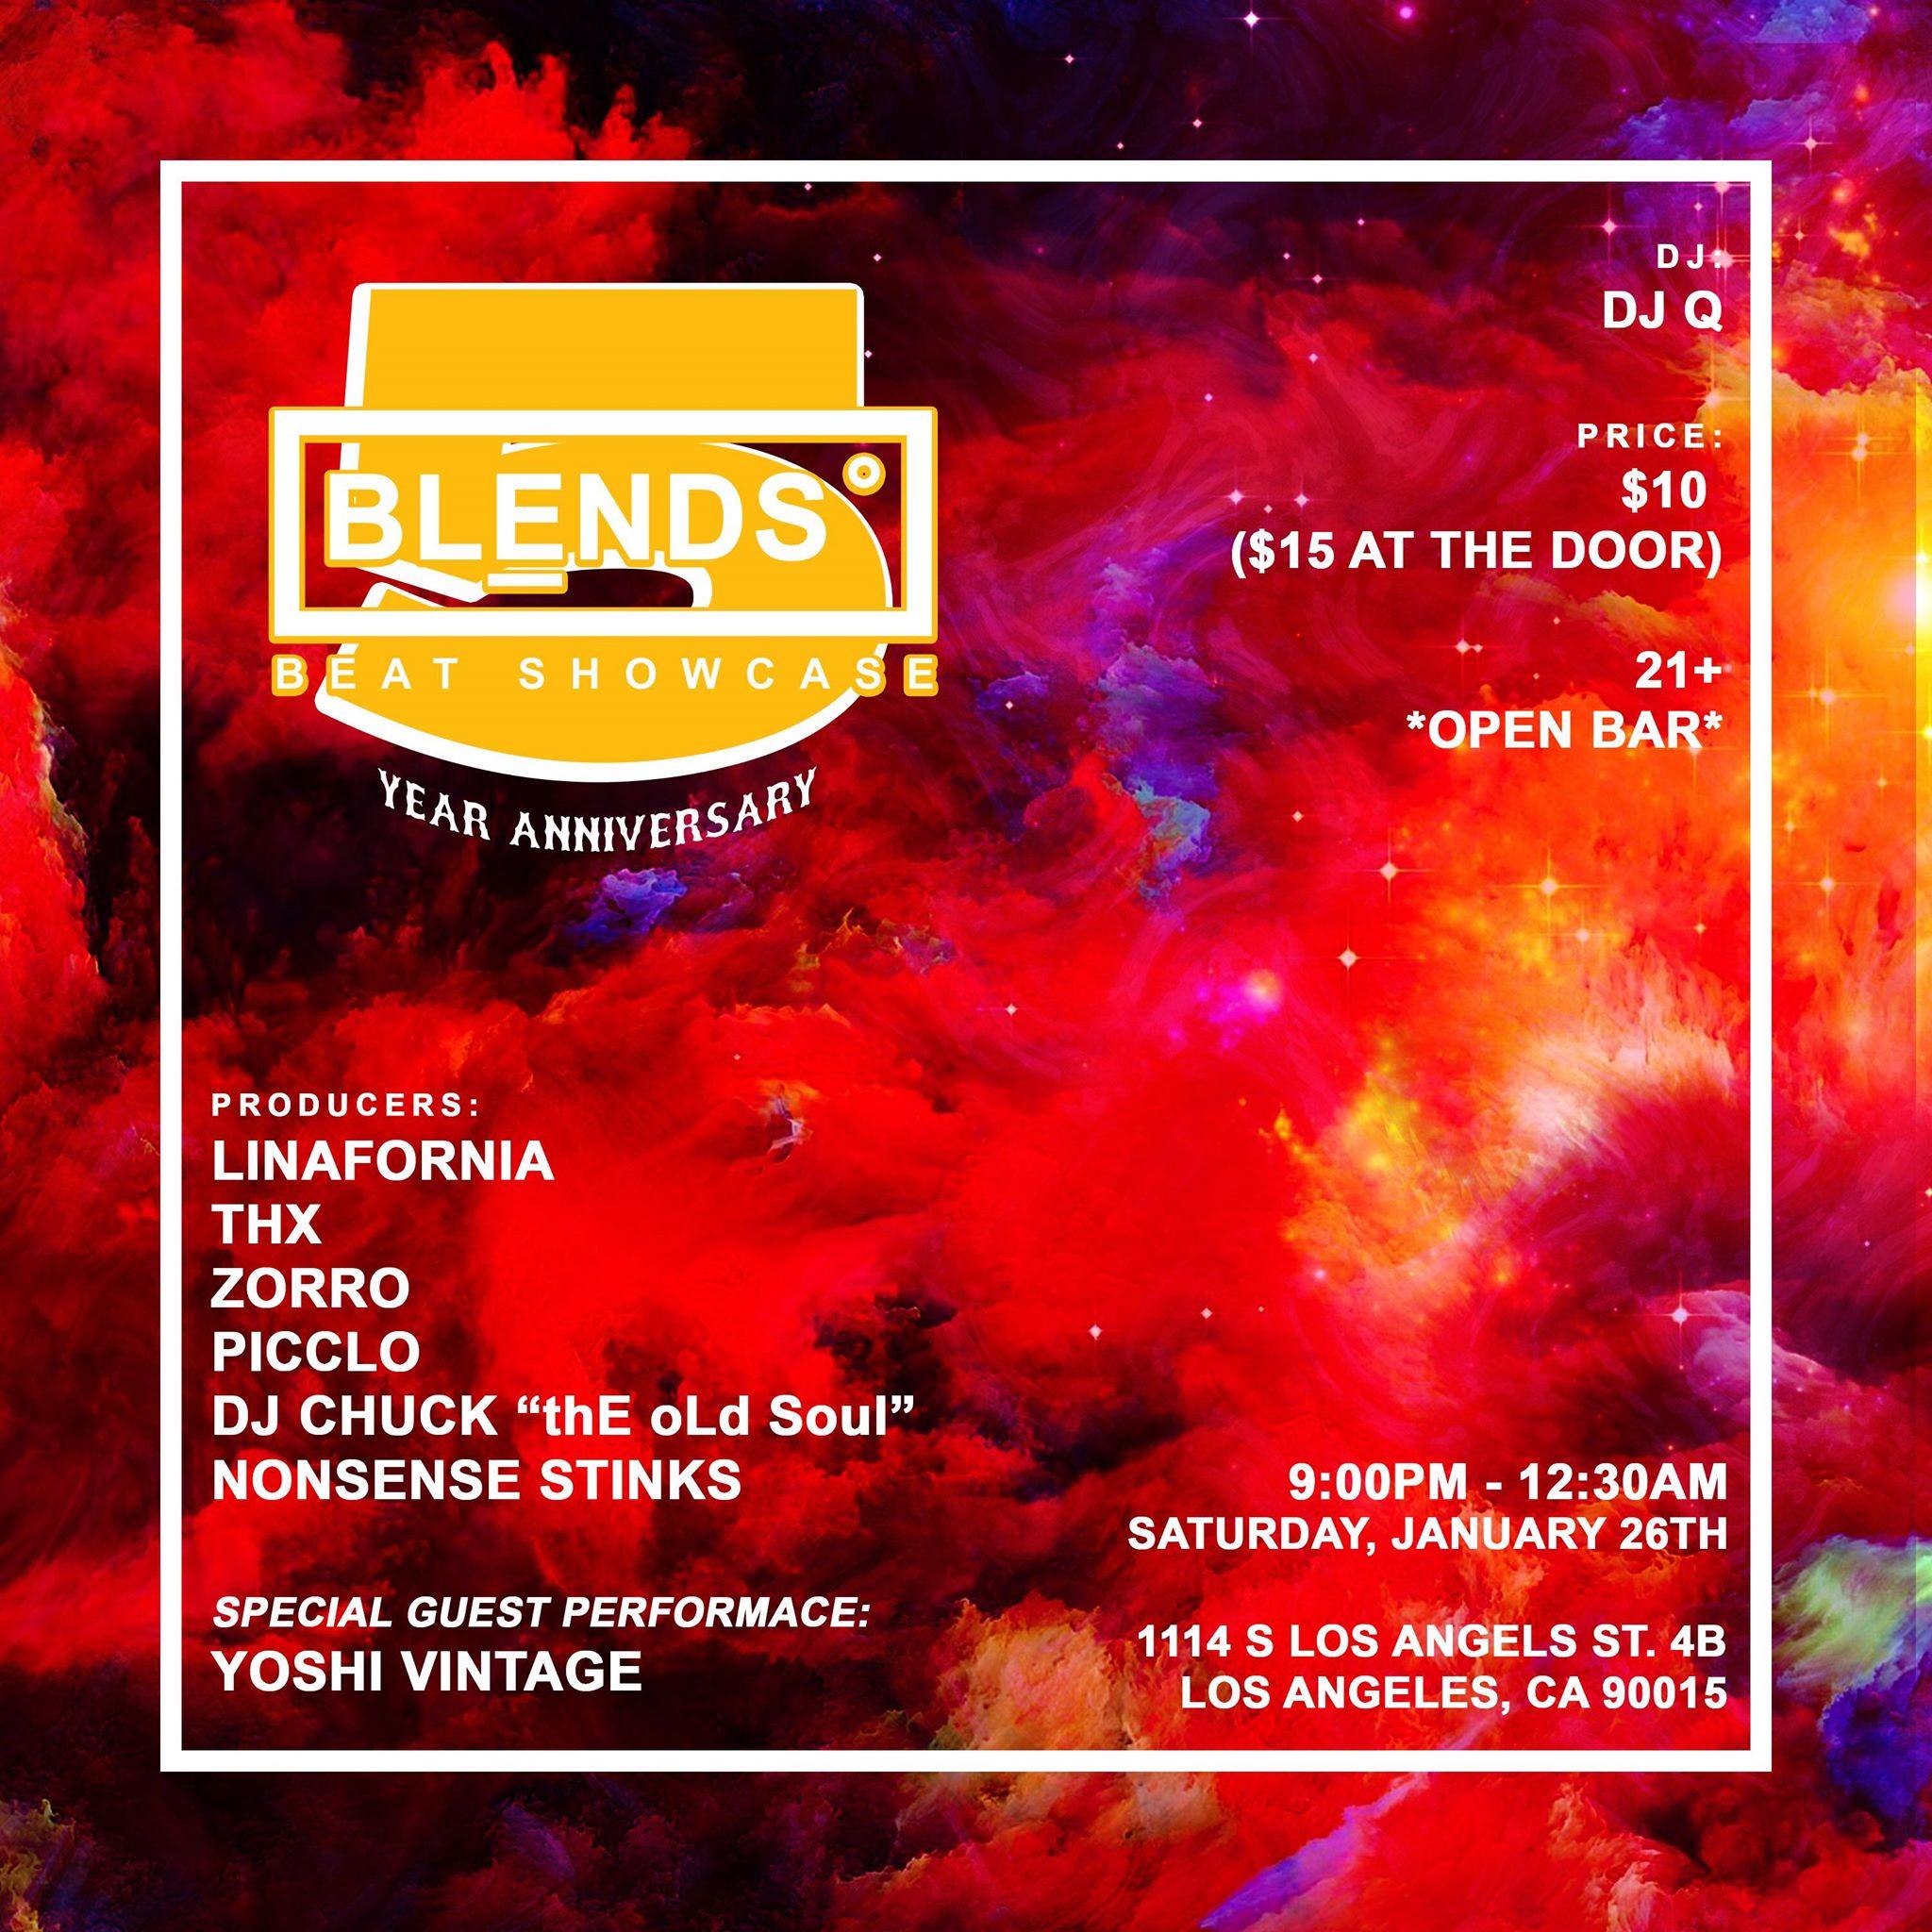 BLENDS 5 Year Beat Showcase